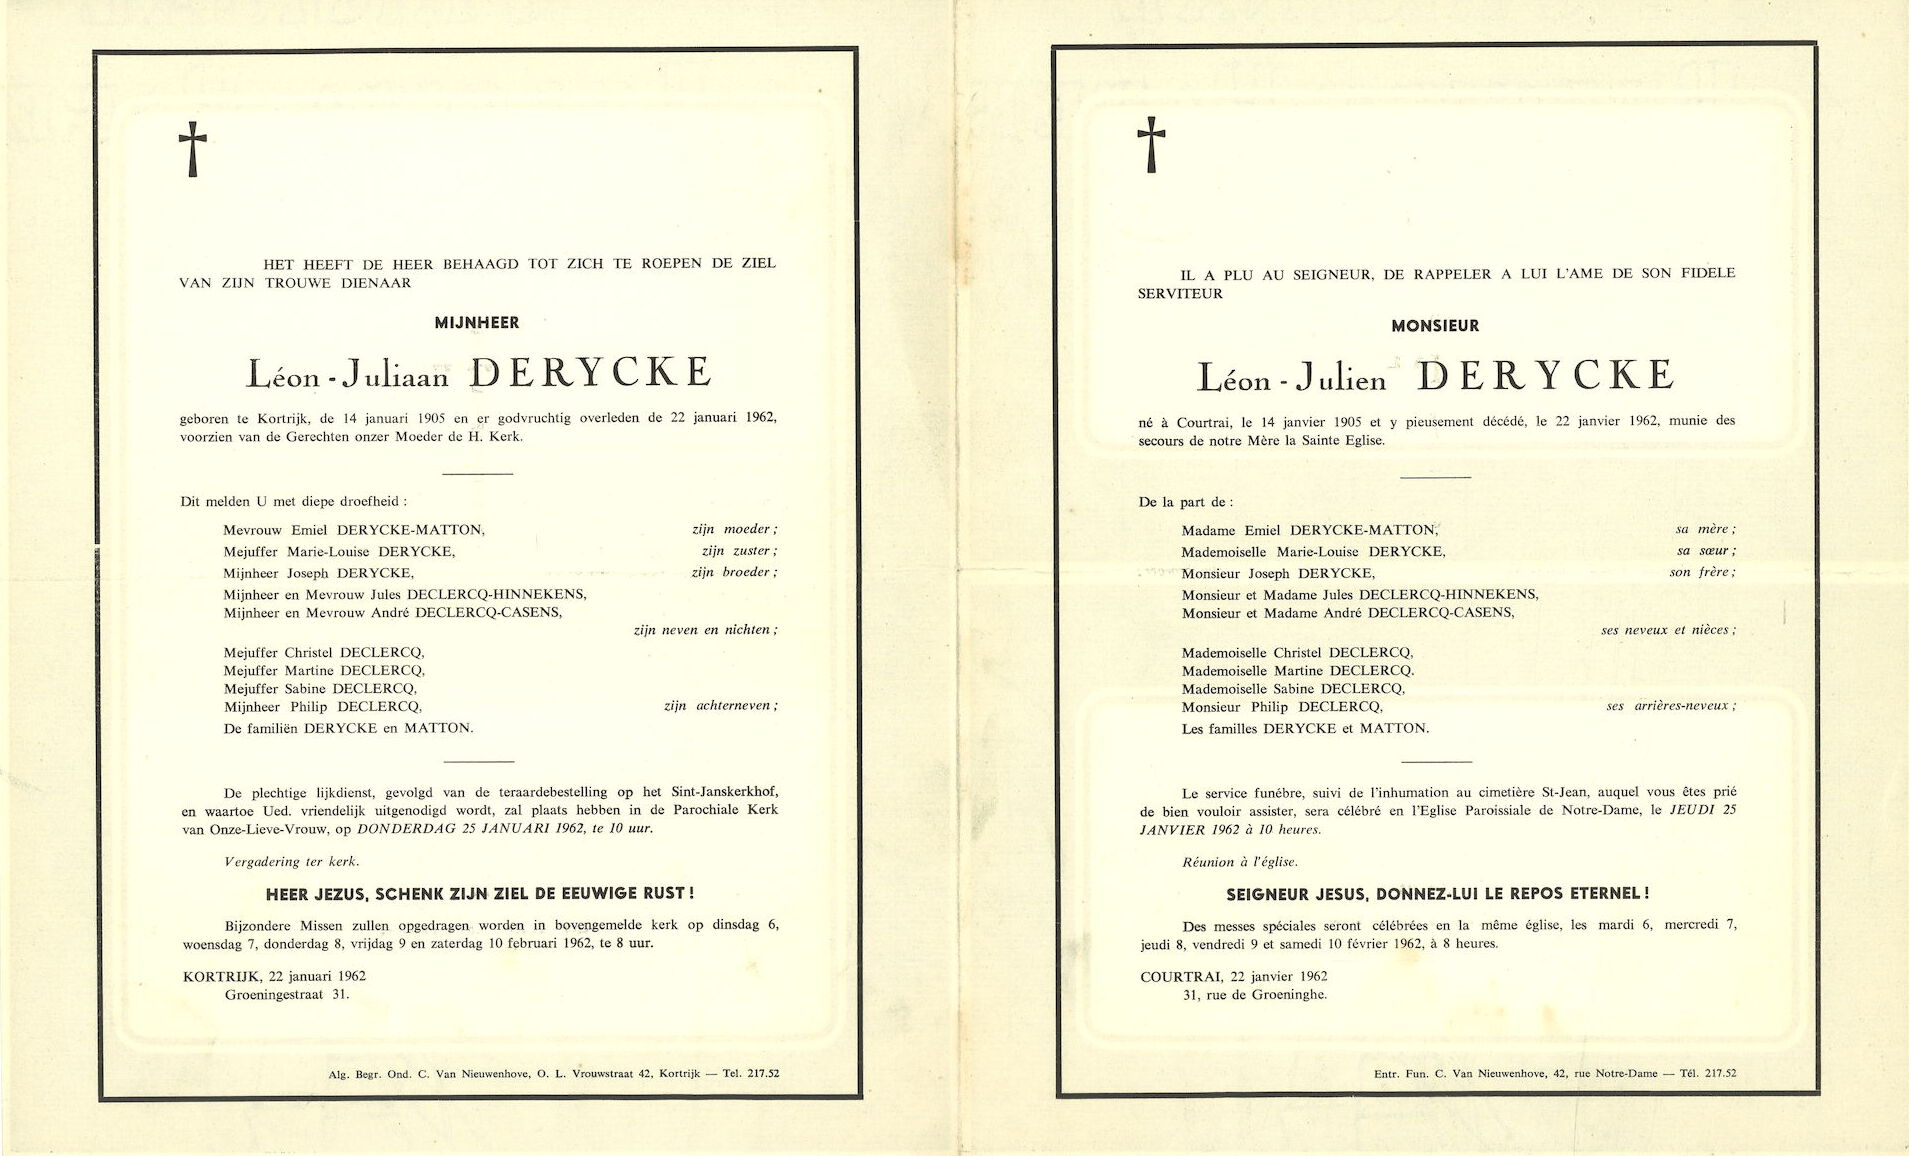 Léon-Juliaan Derycke